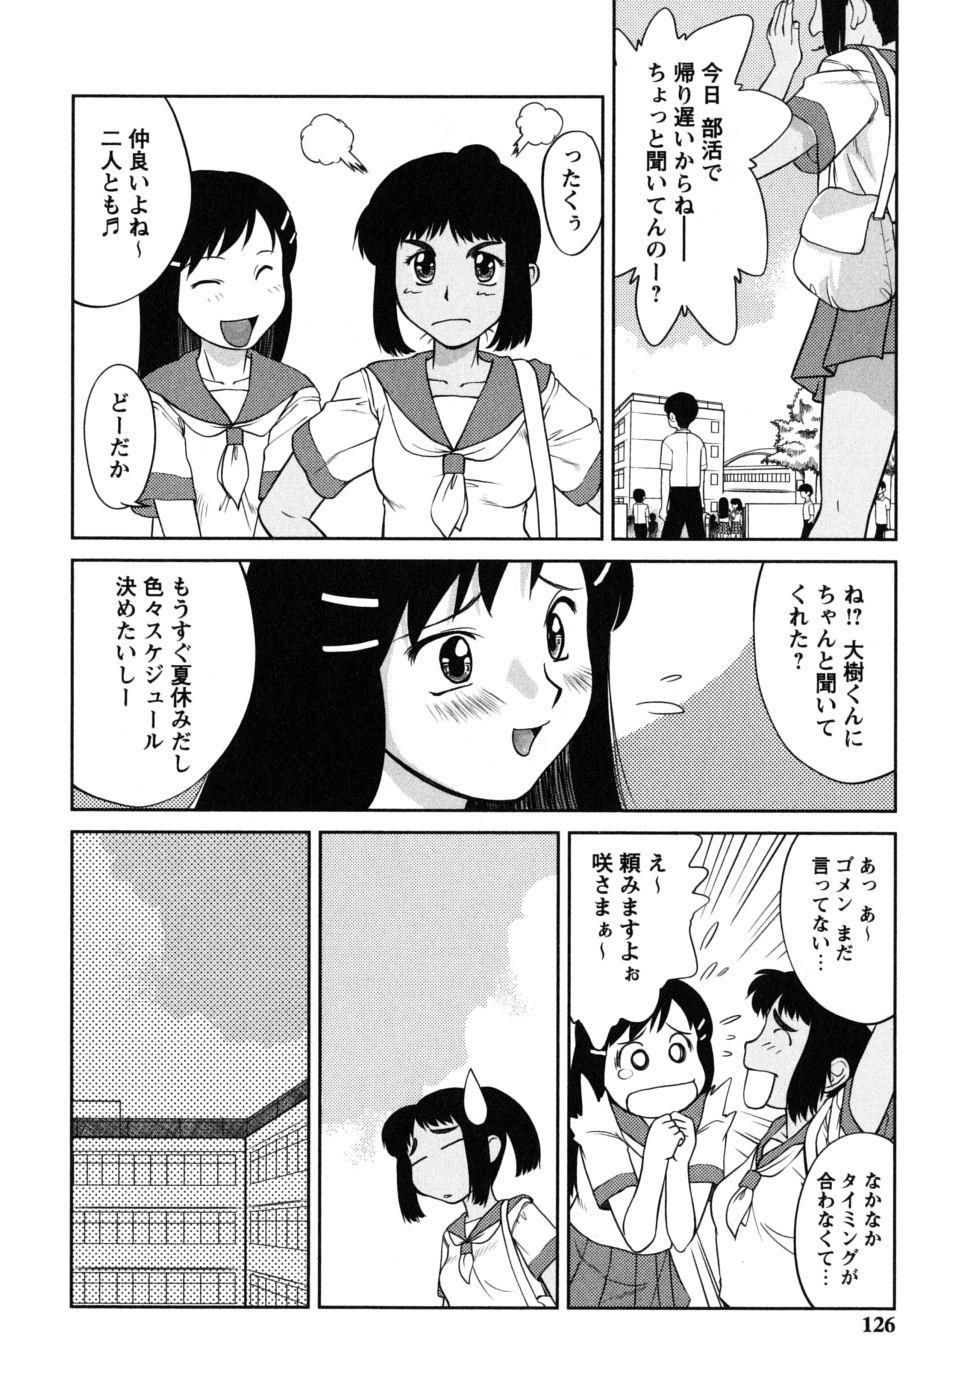 Futa Go Ecchi 125